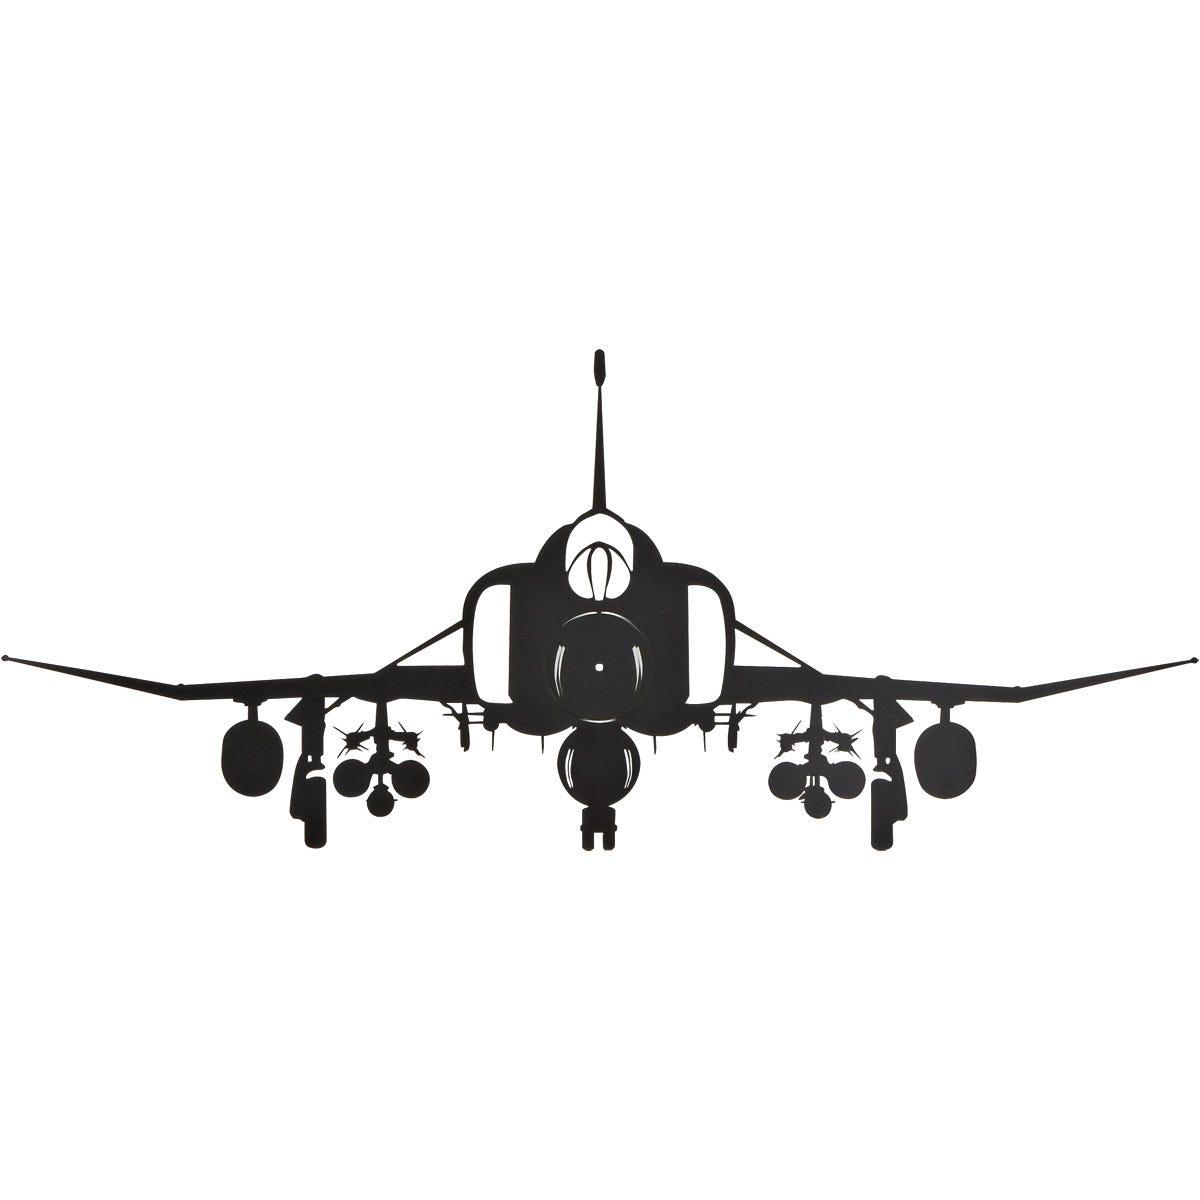 9ffb5eeb8bd Phantom Silhouette Aircraft Metal Sign - from Sporty s Pilot Shop